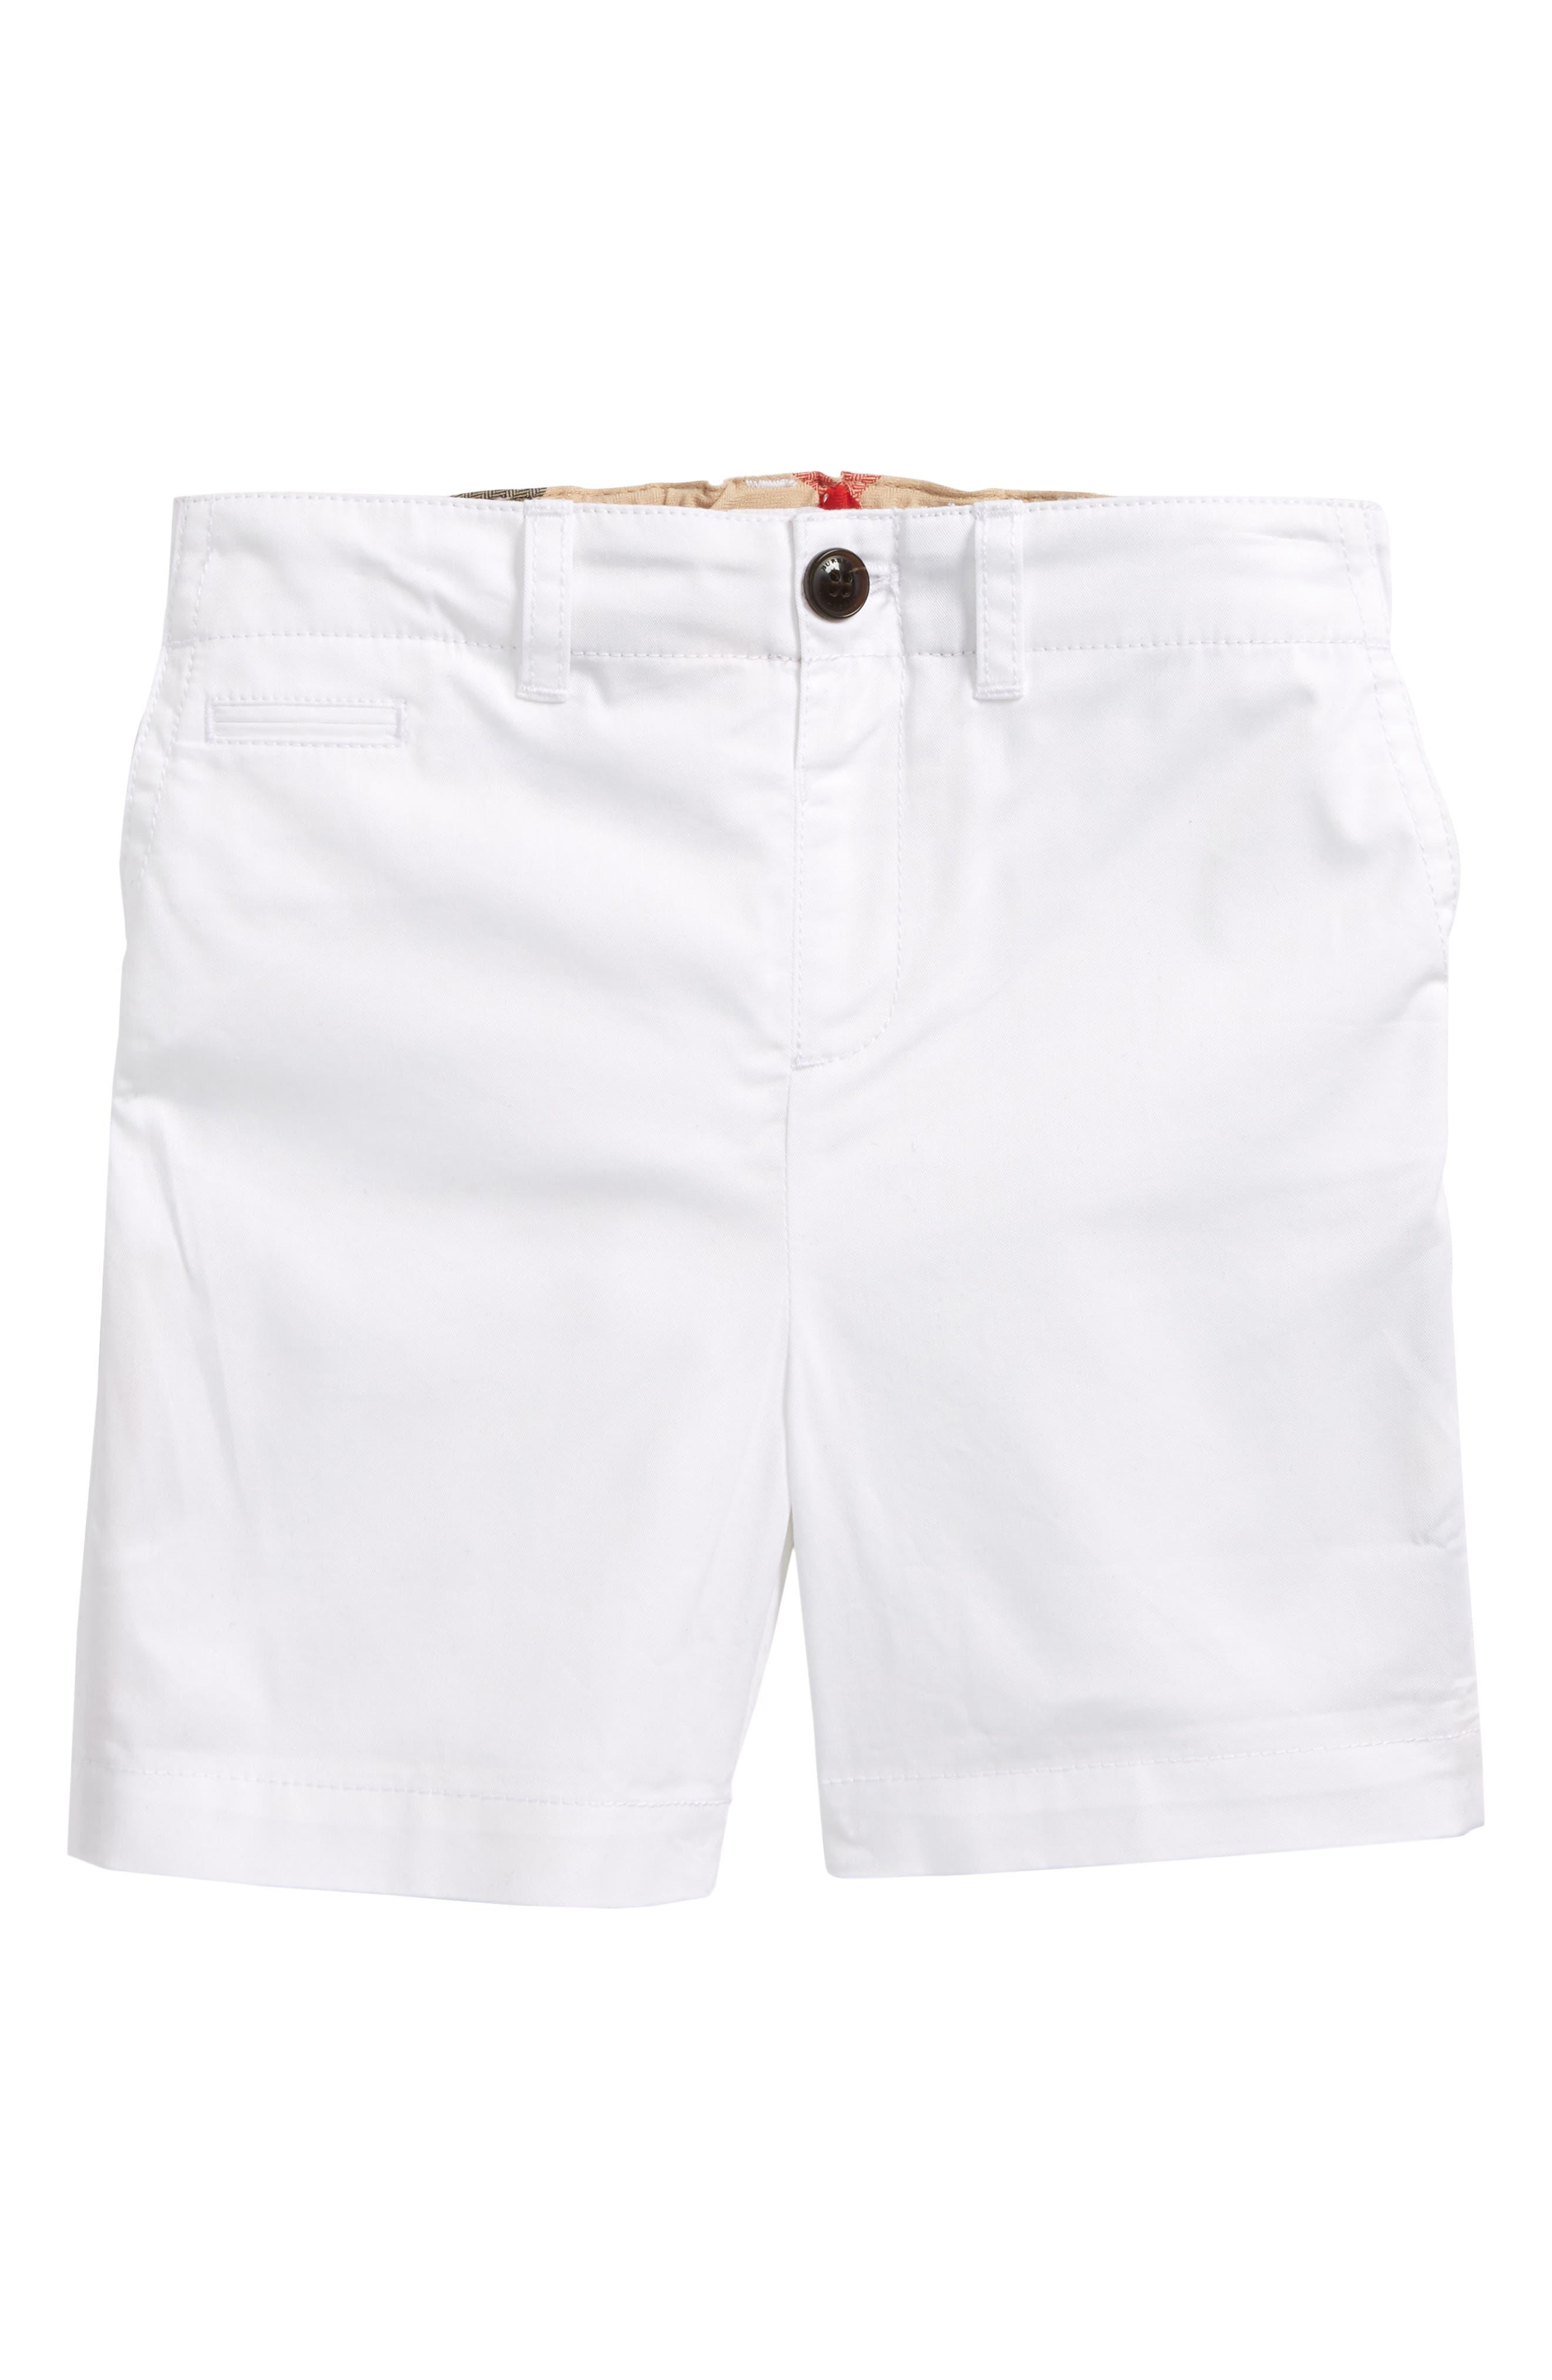 Tina Cotton Twill Shorts,                         Main,                         color,